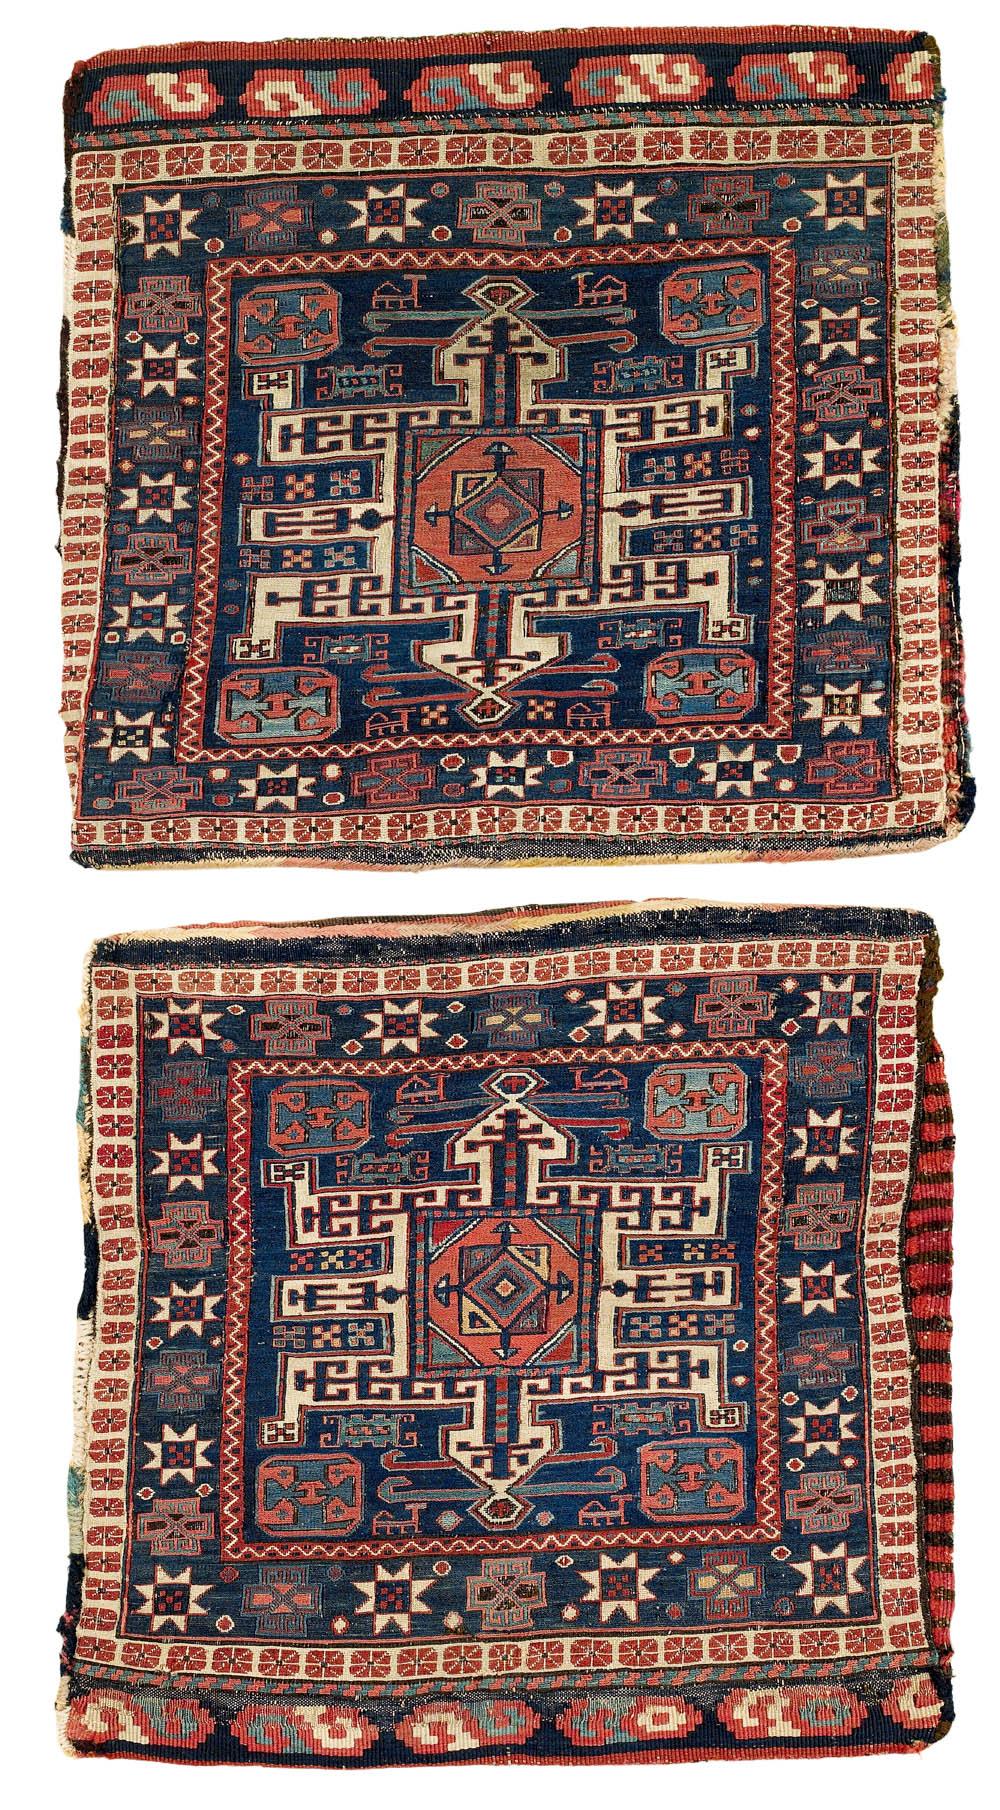 Shahsavan Khorjin, Moghan-Savalan region, circa A: 50 x 52 cm, B: 49 x 53 cm, mid 19th century, estimate €5,400, sold for €9,150 ($11,255)